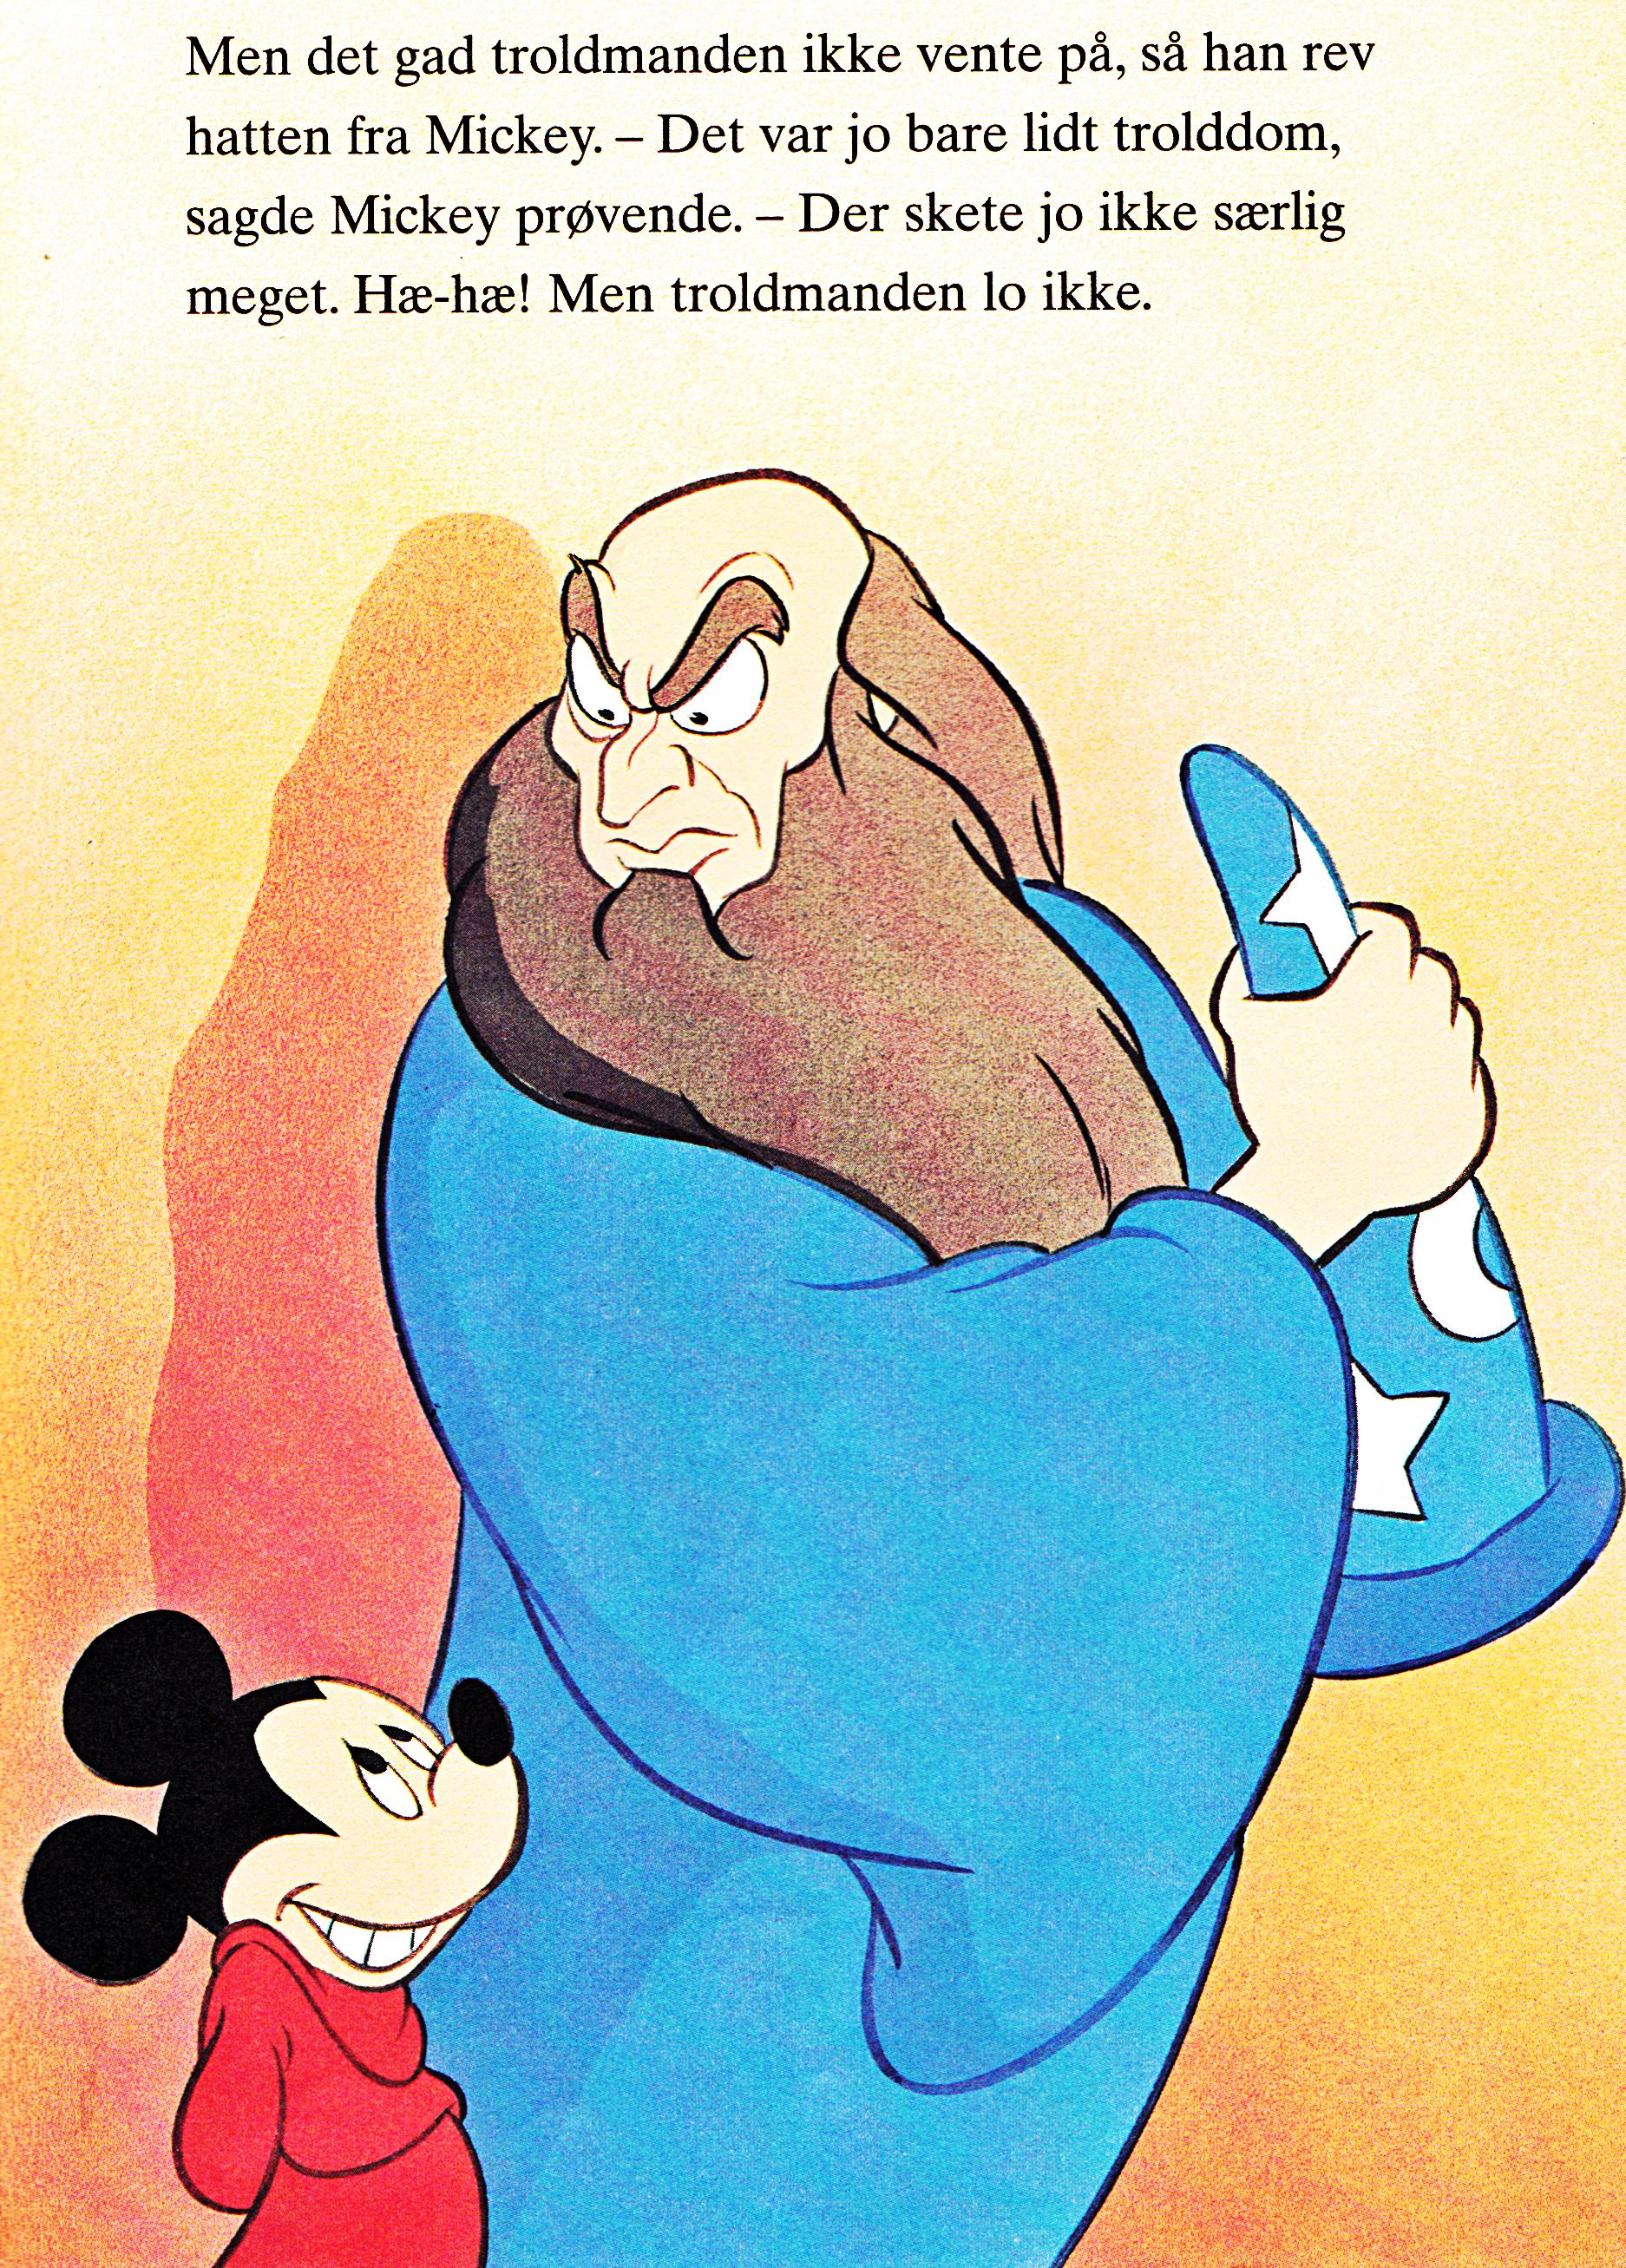 Walt Disney Book Images - Mickey Mouse & Yen Sid